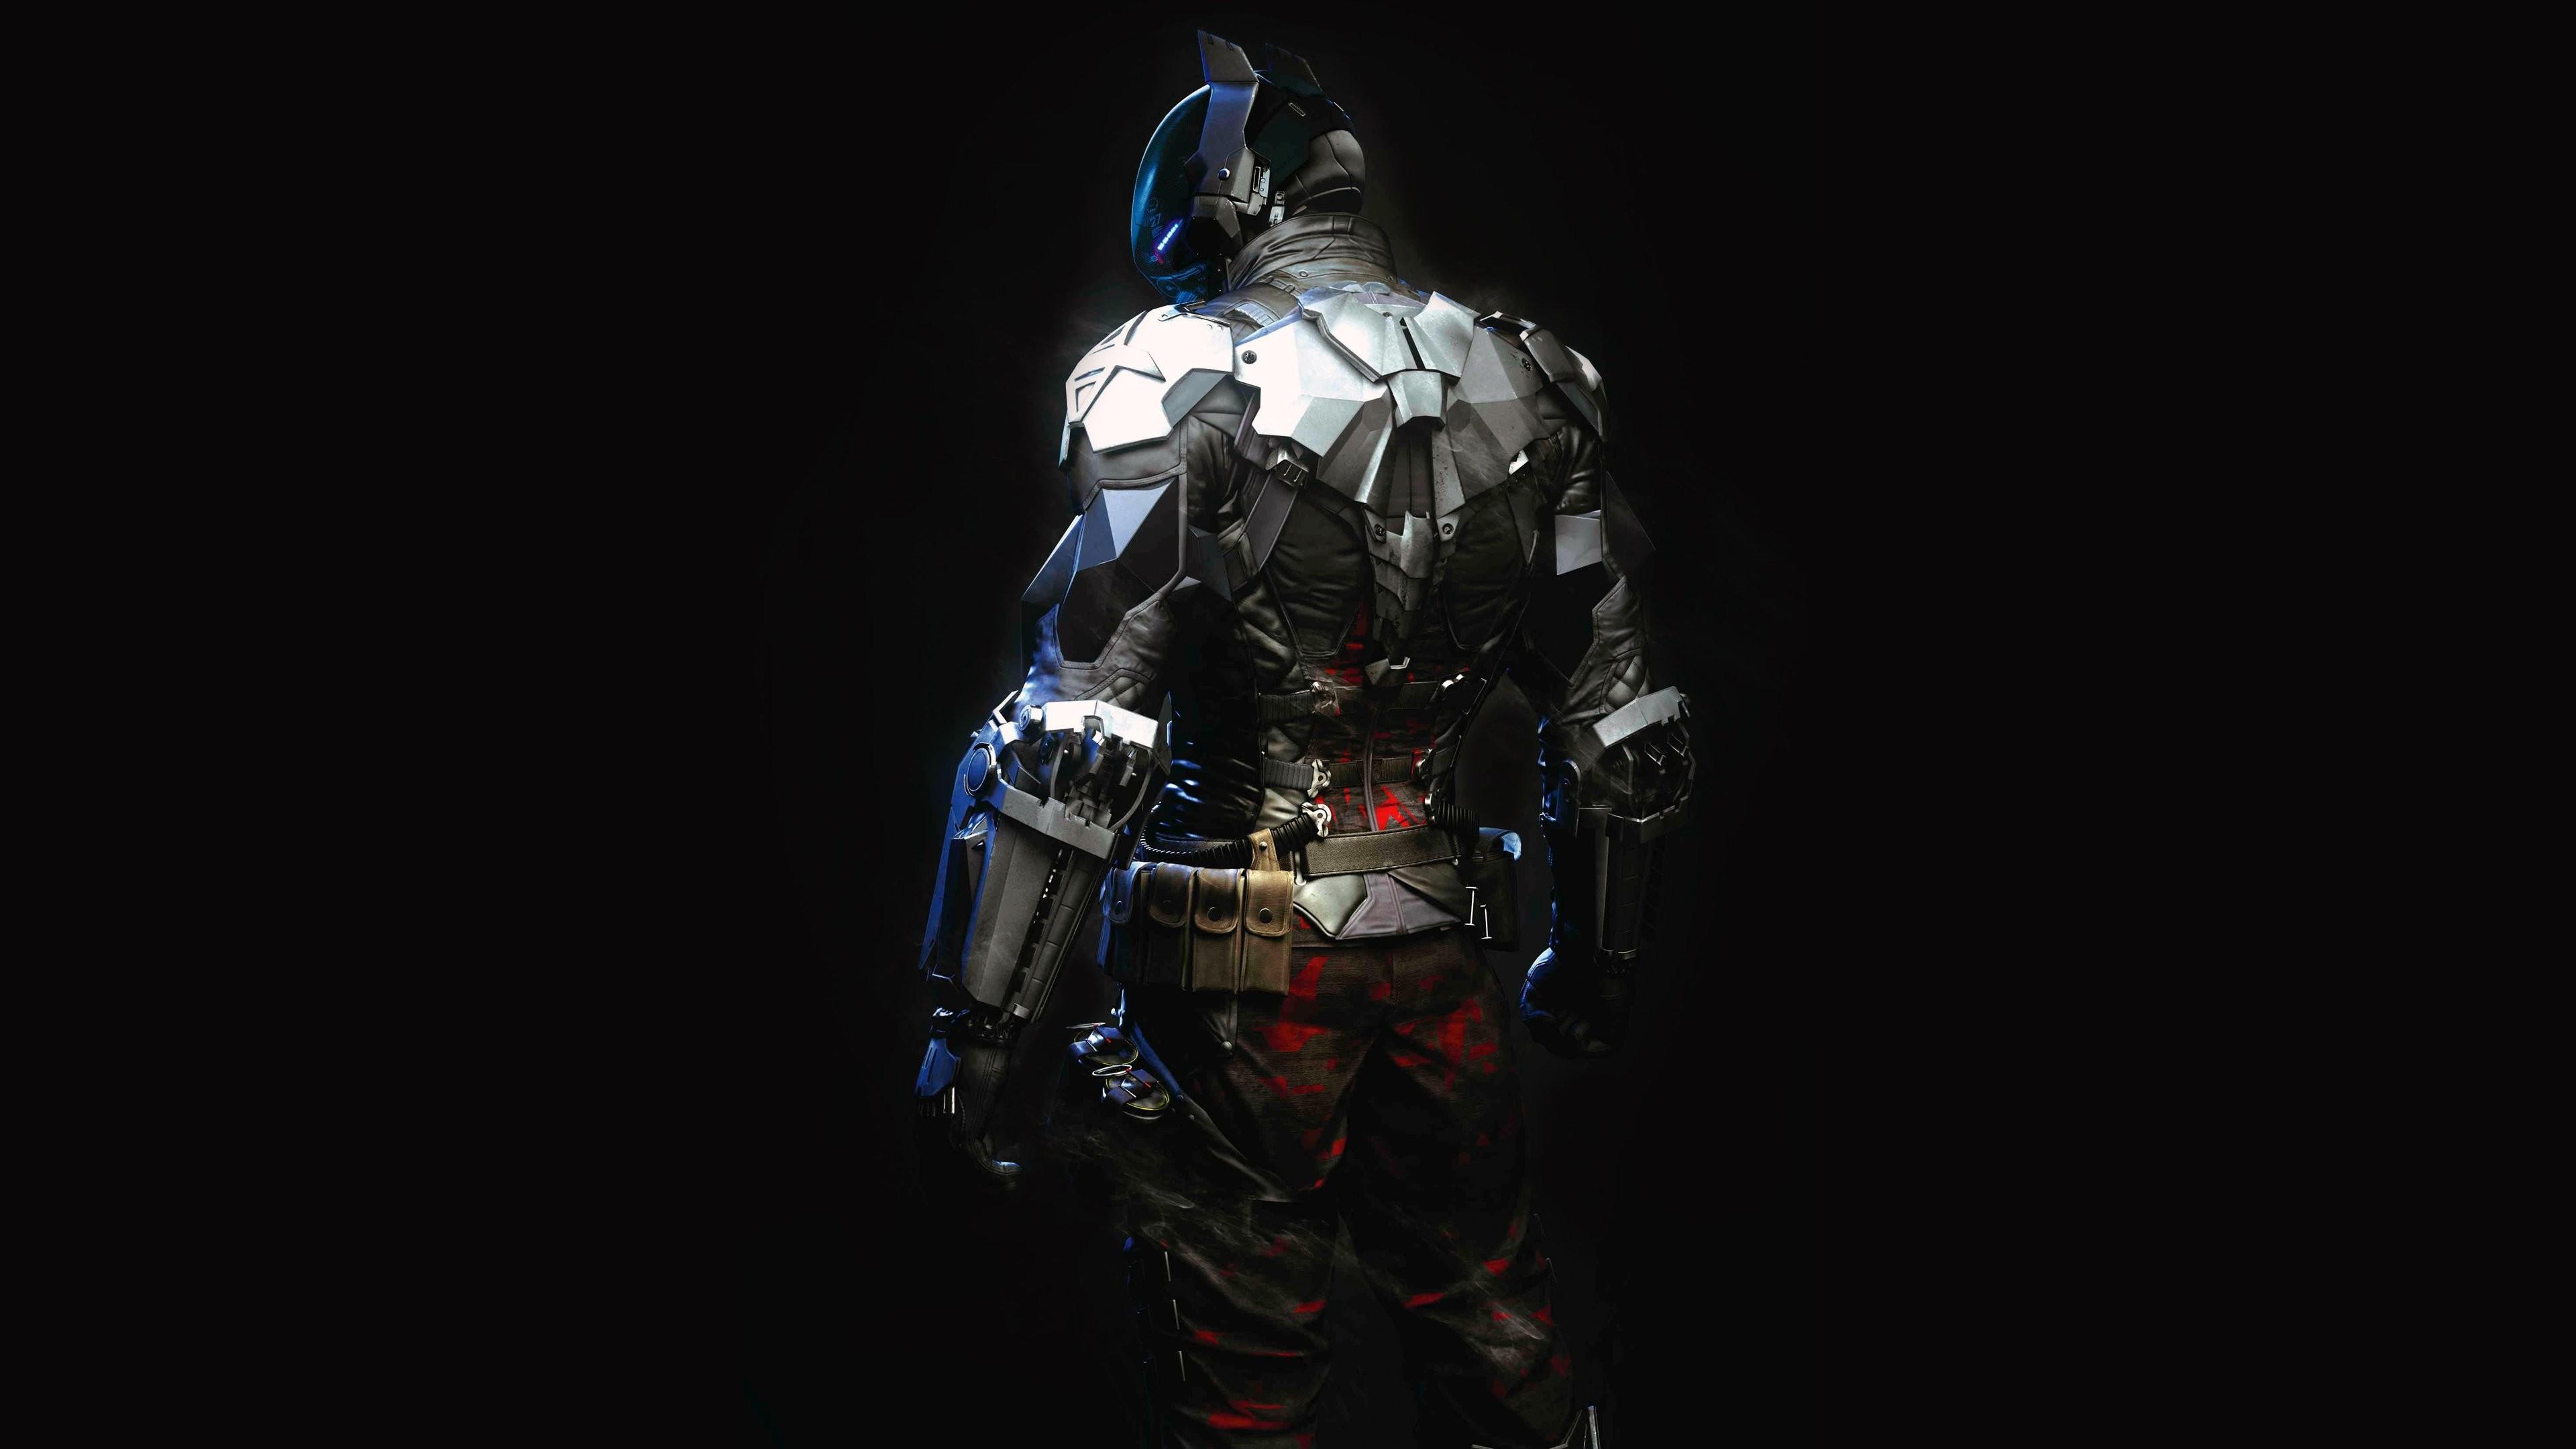 BATMAN ARKHAM KNIGHT superhero dark action adventure fighting shooter  wallpaper     746605   WallpaperUP